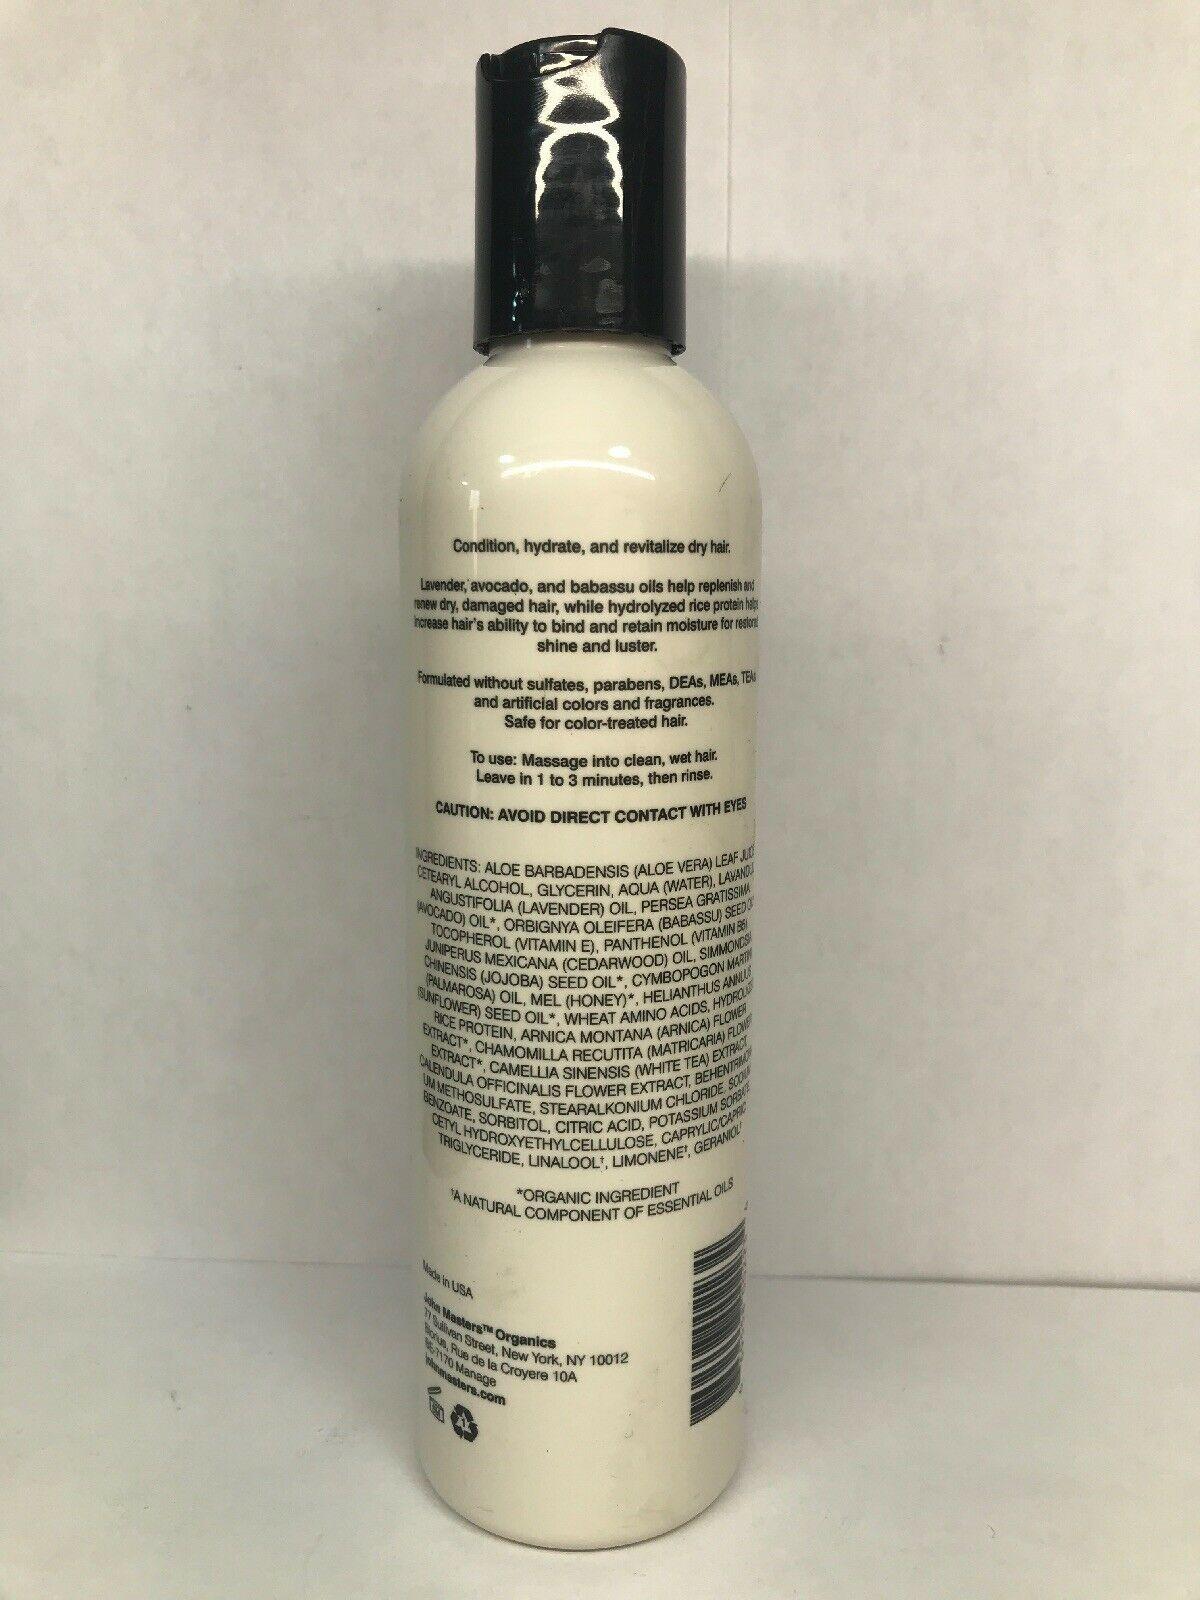 John Masters Organics Conditioner For Dry Hair 8 Ounce w/ Lavendar & Avocado image 3